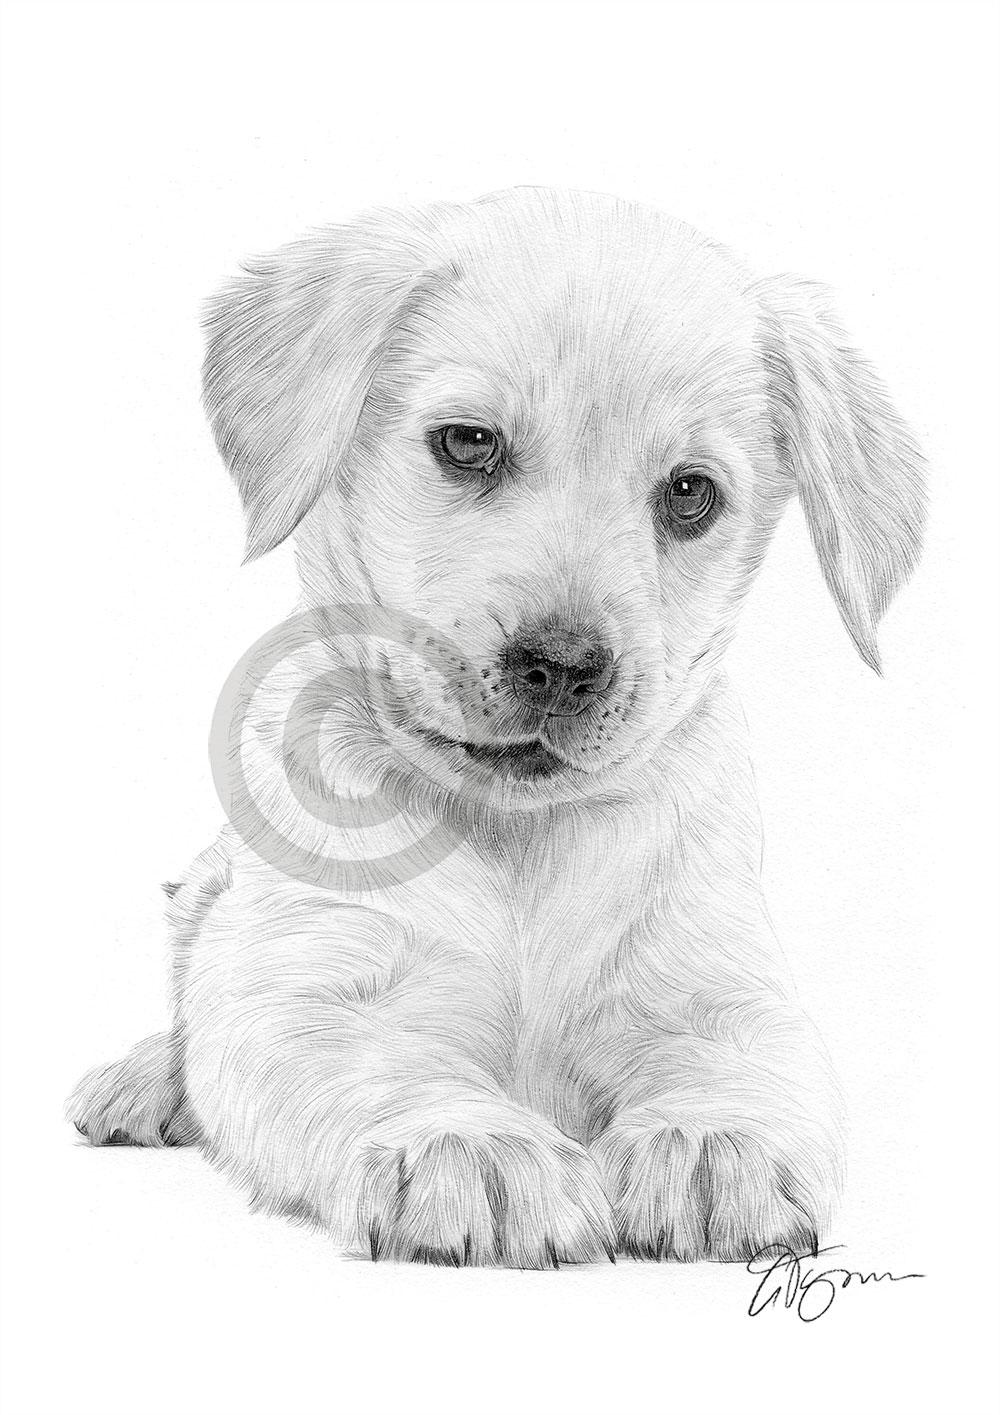 LABRADOR RETRIEVER PUPPY Dog Pencil Drawing Artwork Print A4 Size Pet Portrait | EBay